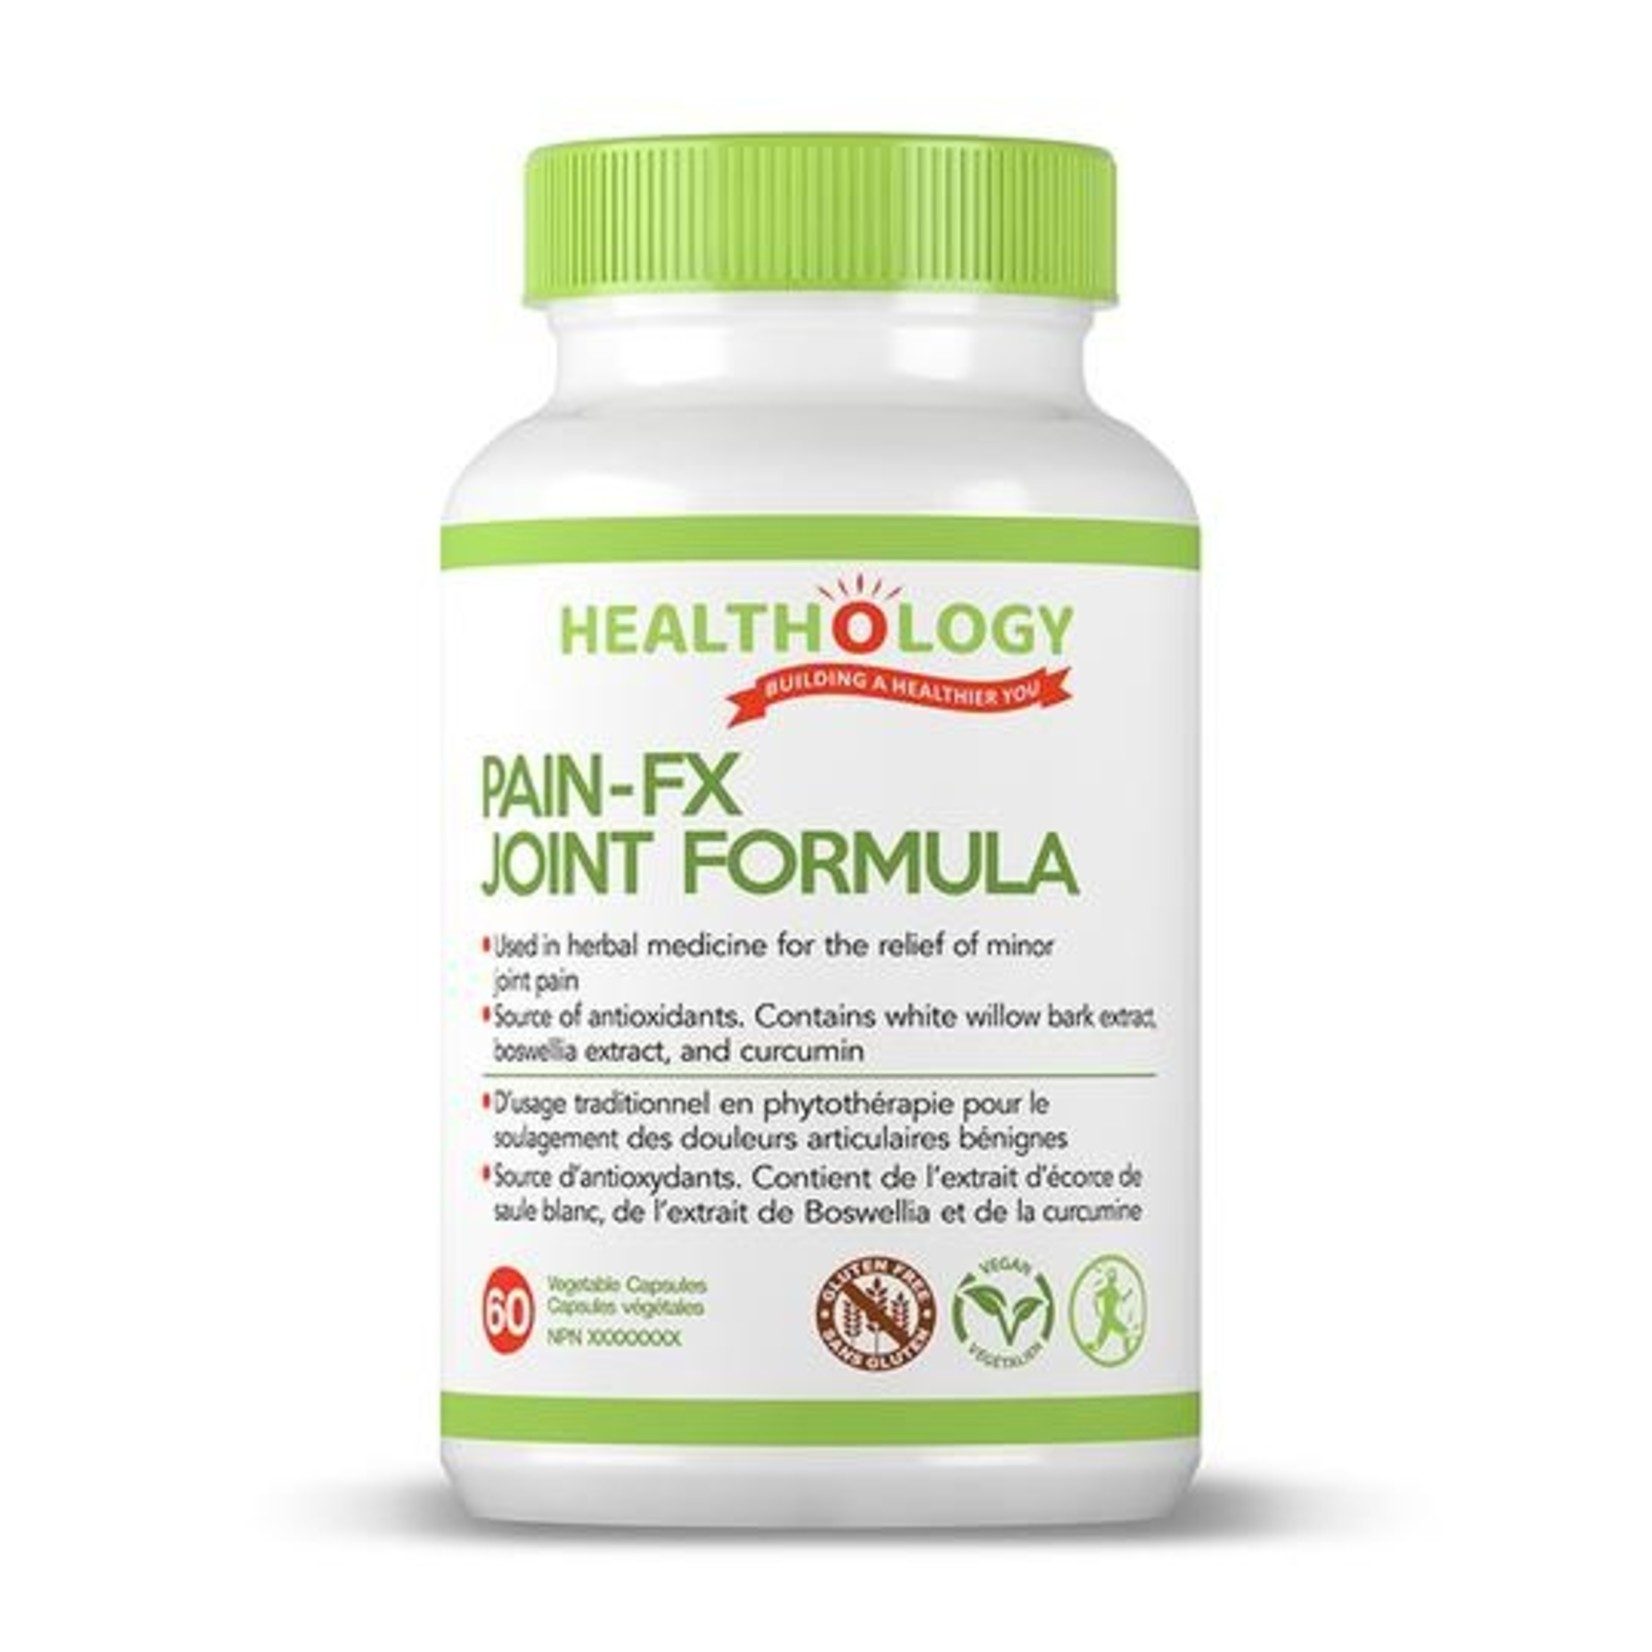 Healthology Healthology Pain-FX Joint Formula 60 caps